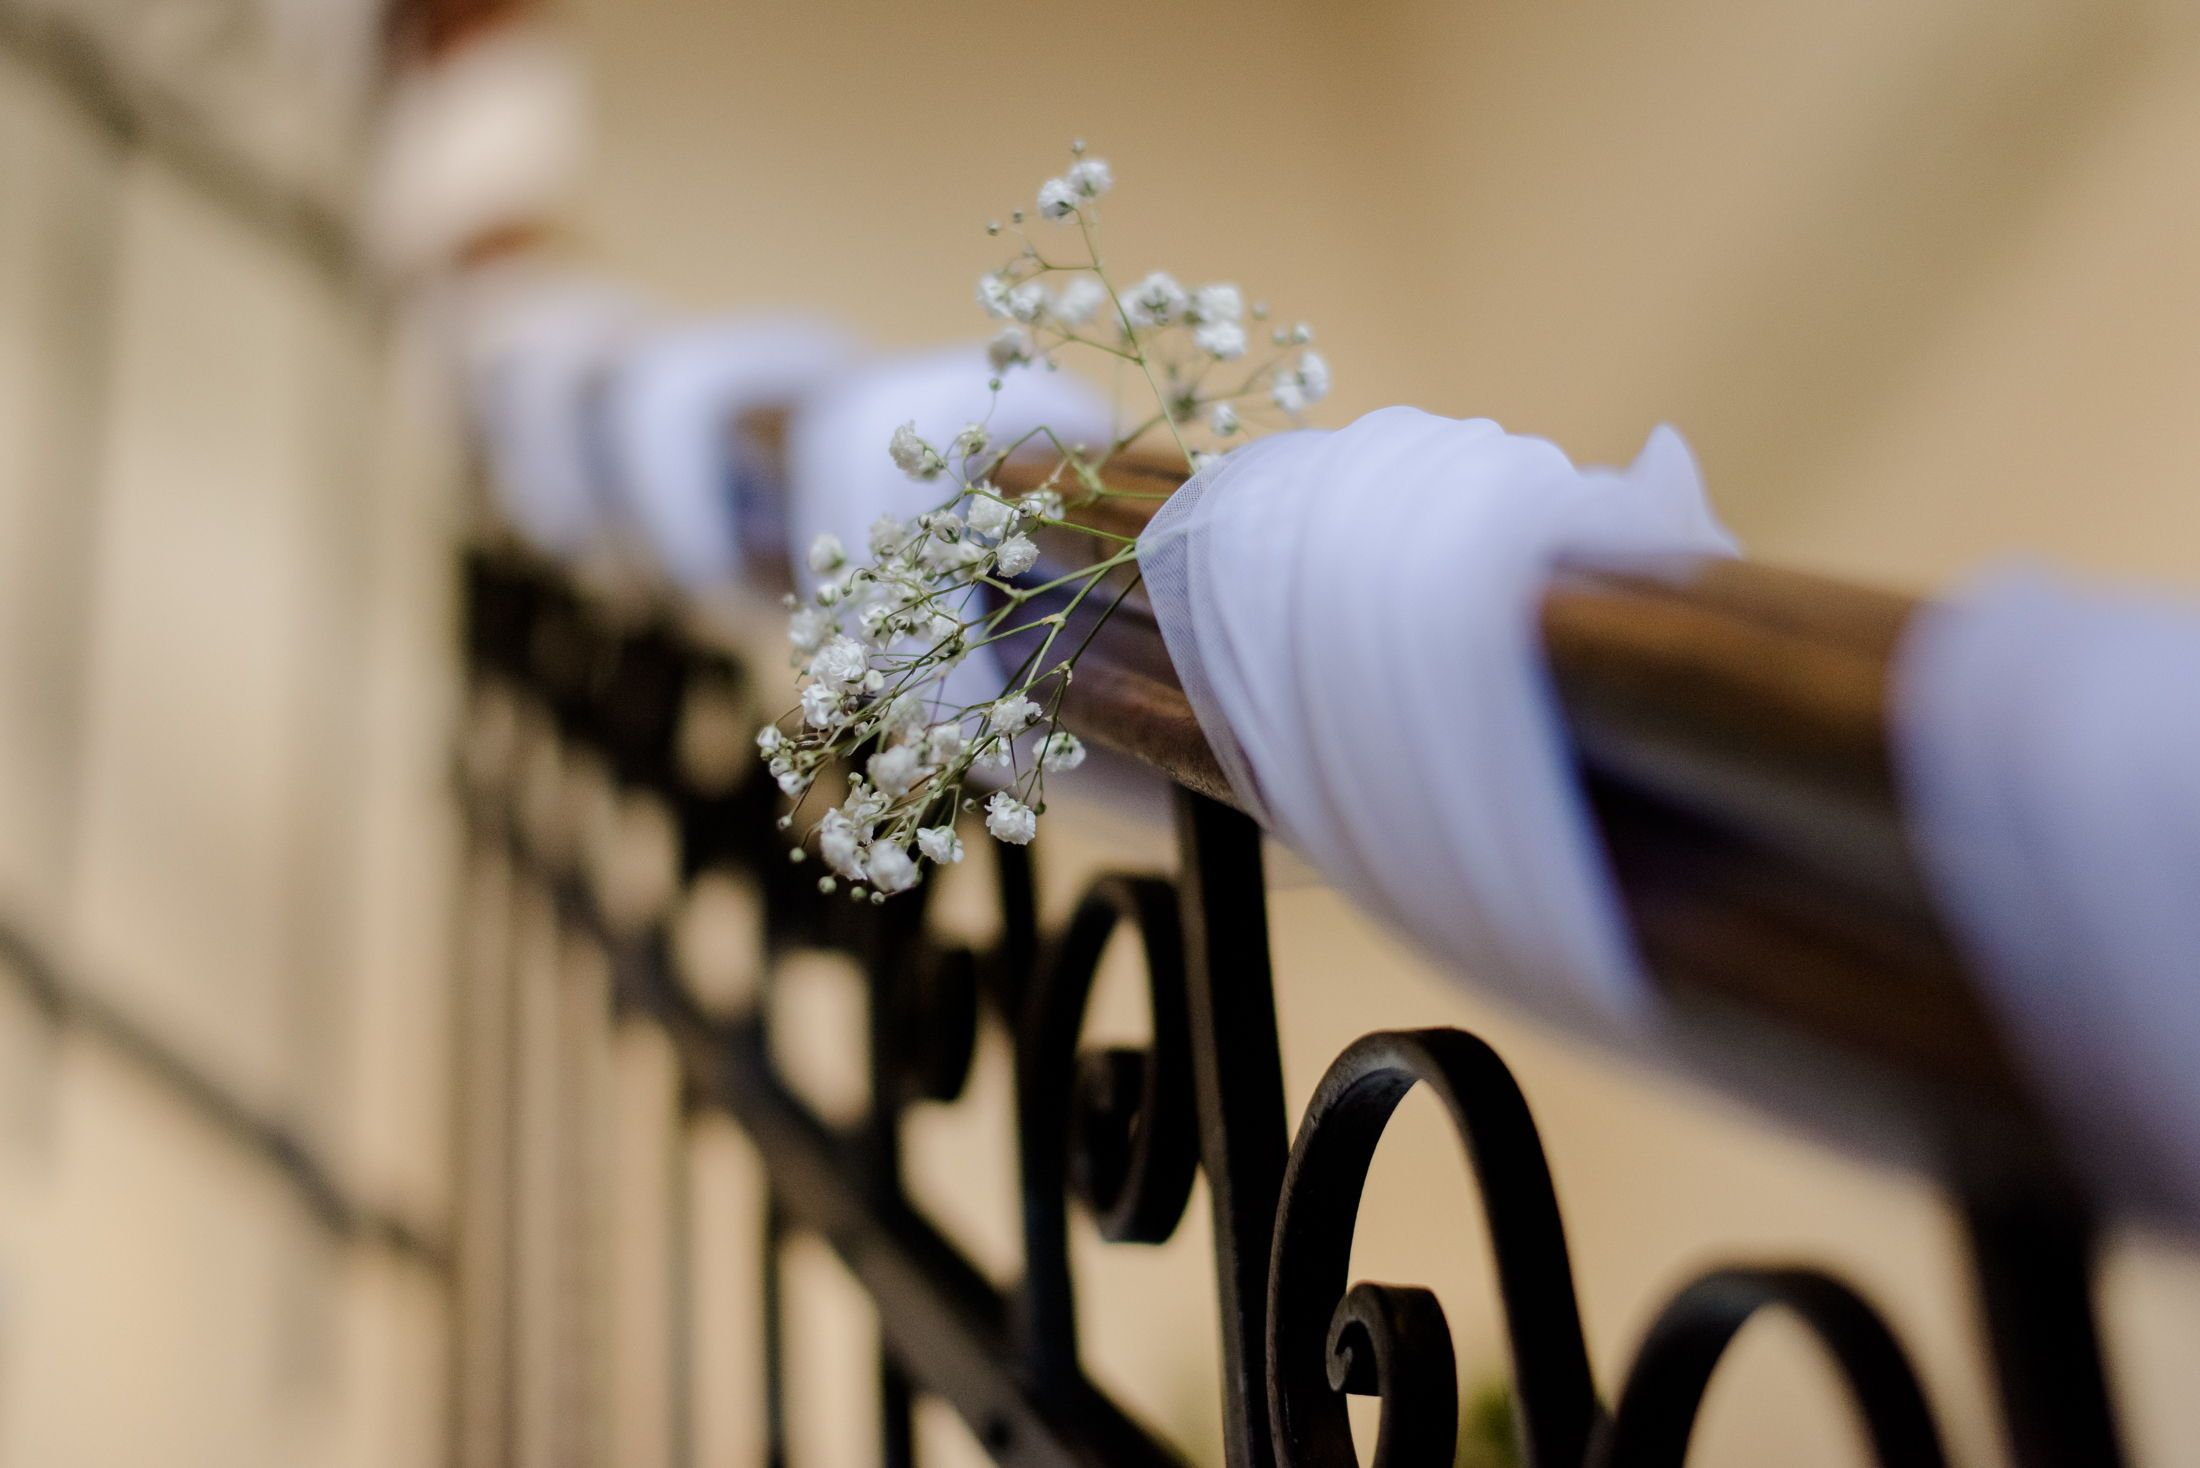 Matrimonio Country Chic Pisa : A beautiful and country chic italian wedding in pisa